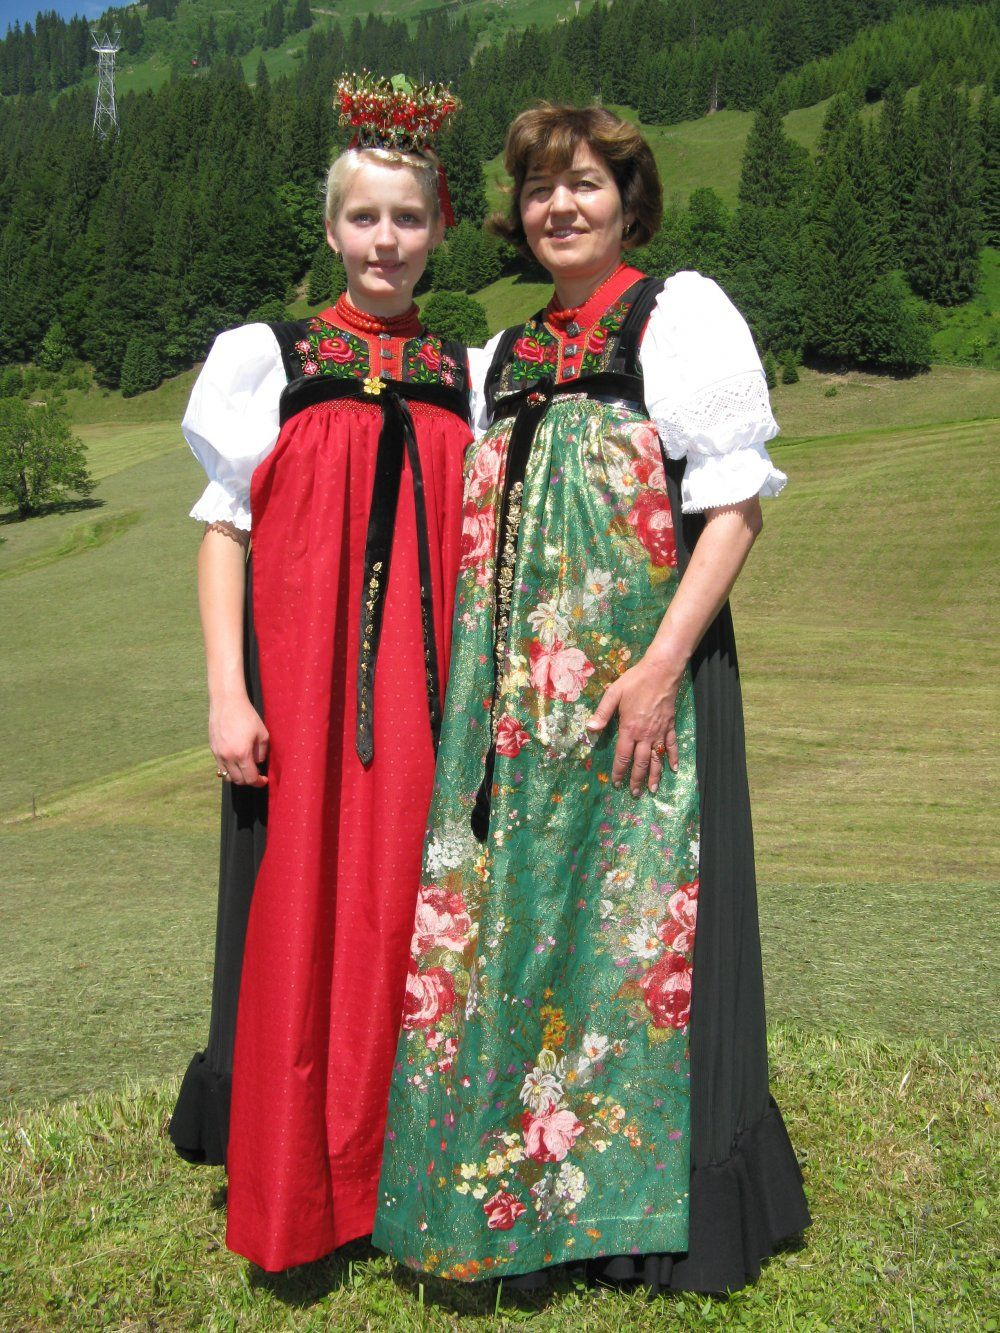 Frauen suchen männer in christiansburg va